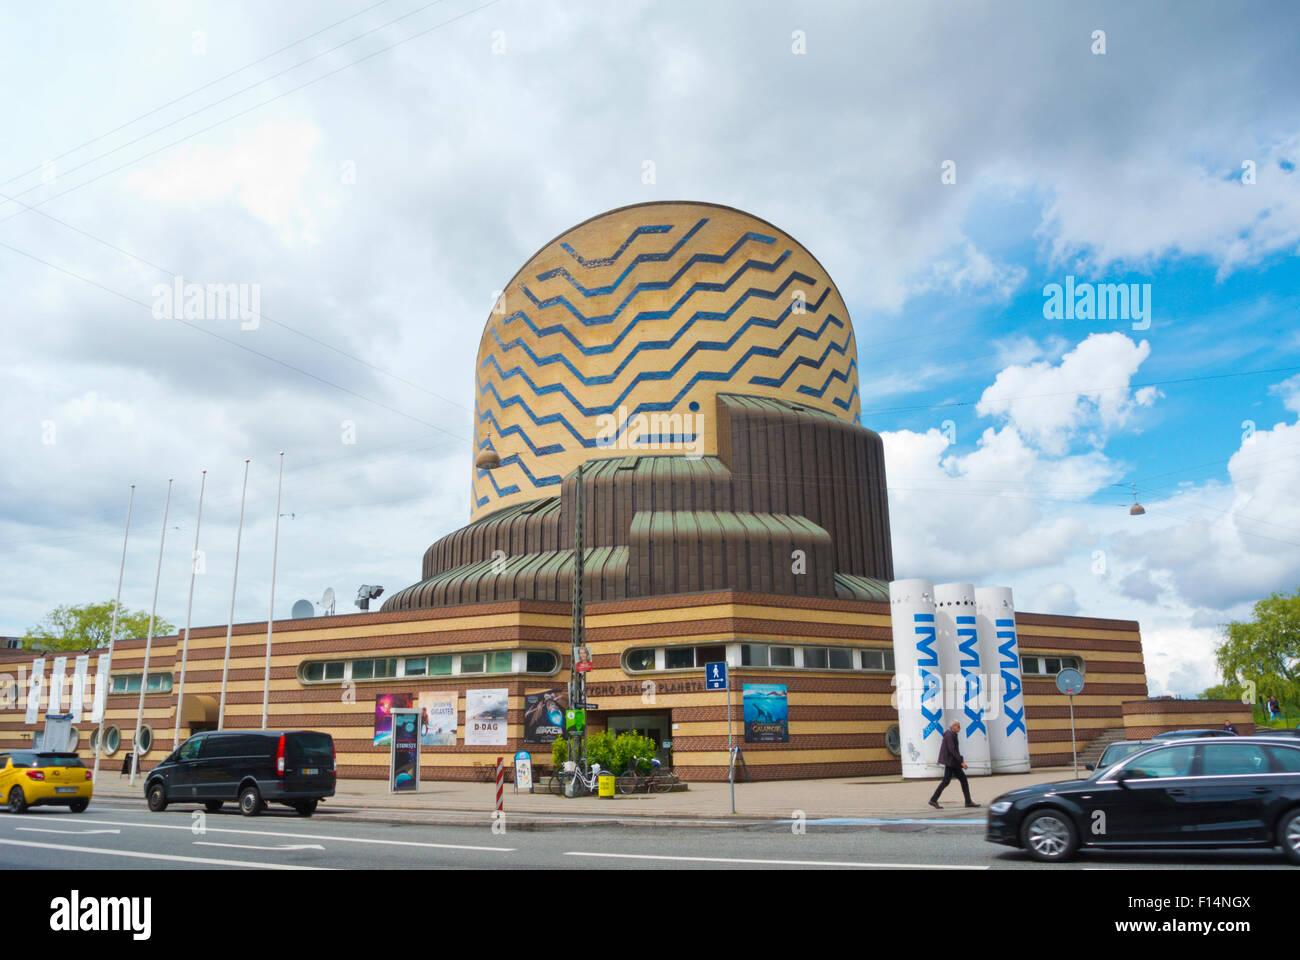 Tycho Brahe Planetarium, iMax cinema, Vesterbro, Copenhagen, Denmark - Stock Image